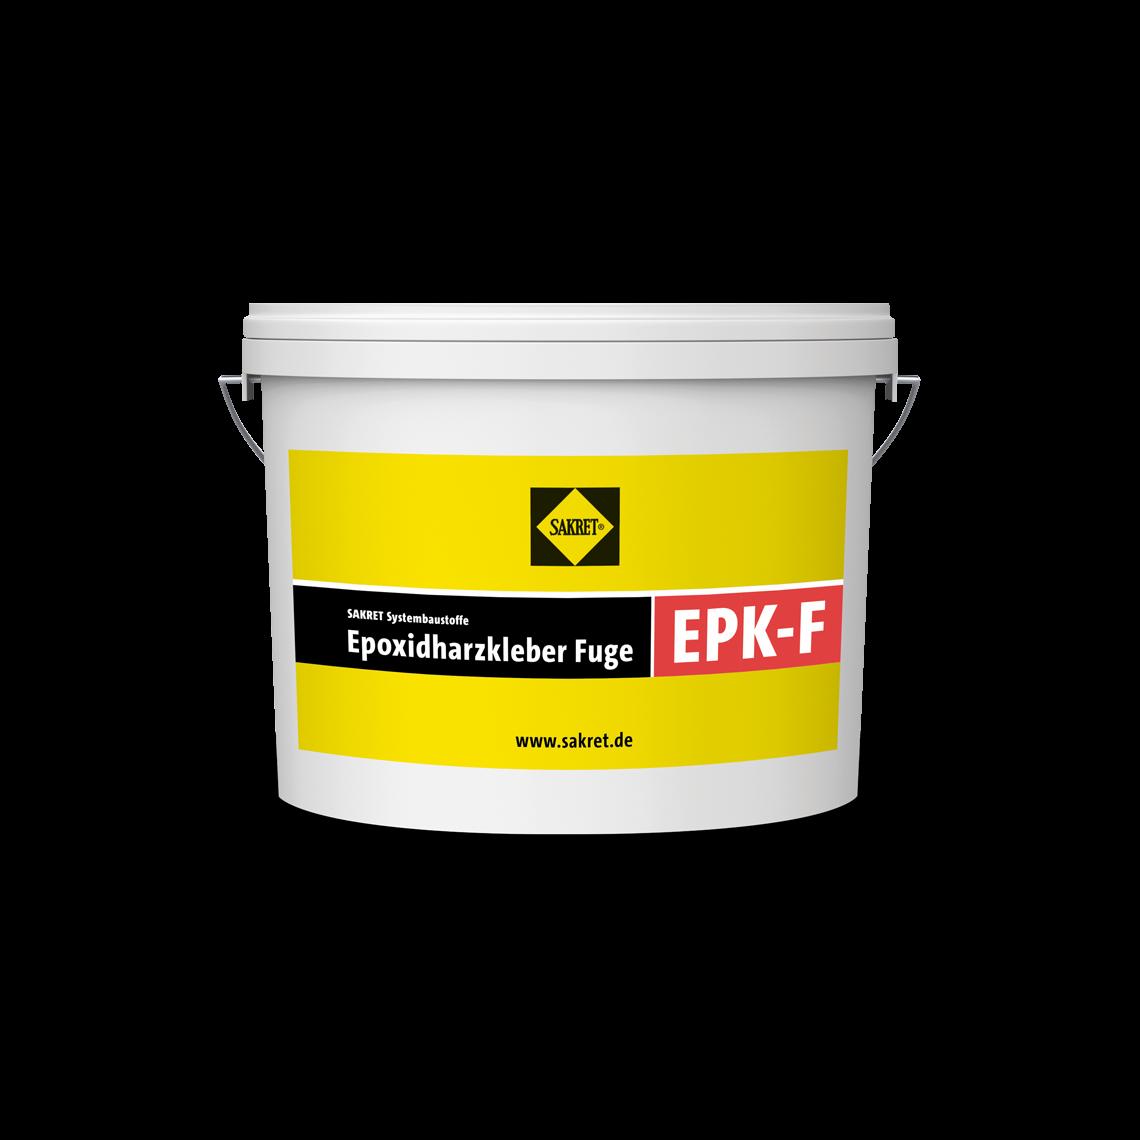 Abbildung SAKRET Epoxidharzkleber-Fuge EPK-F